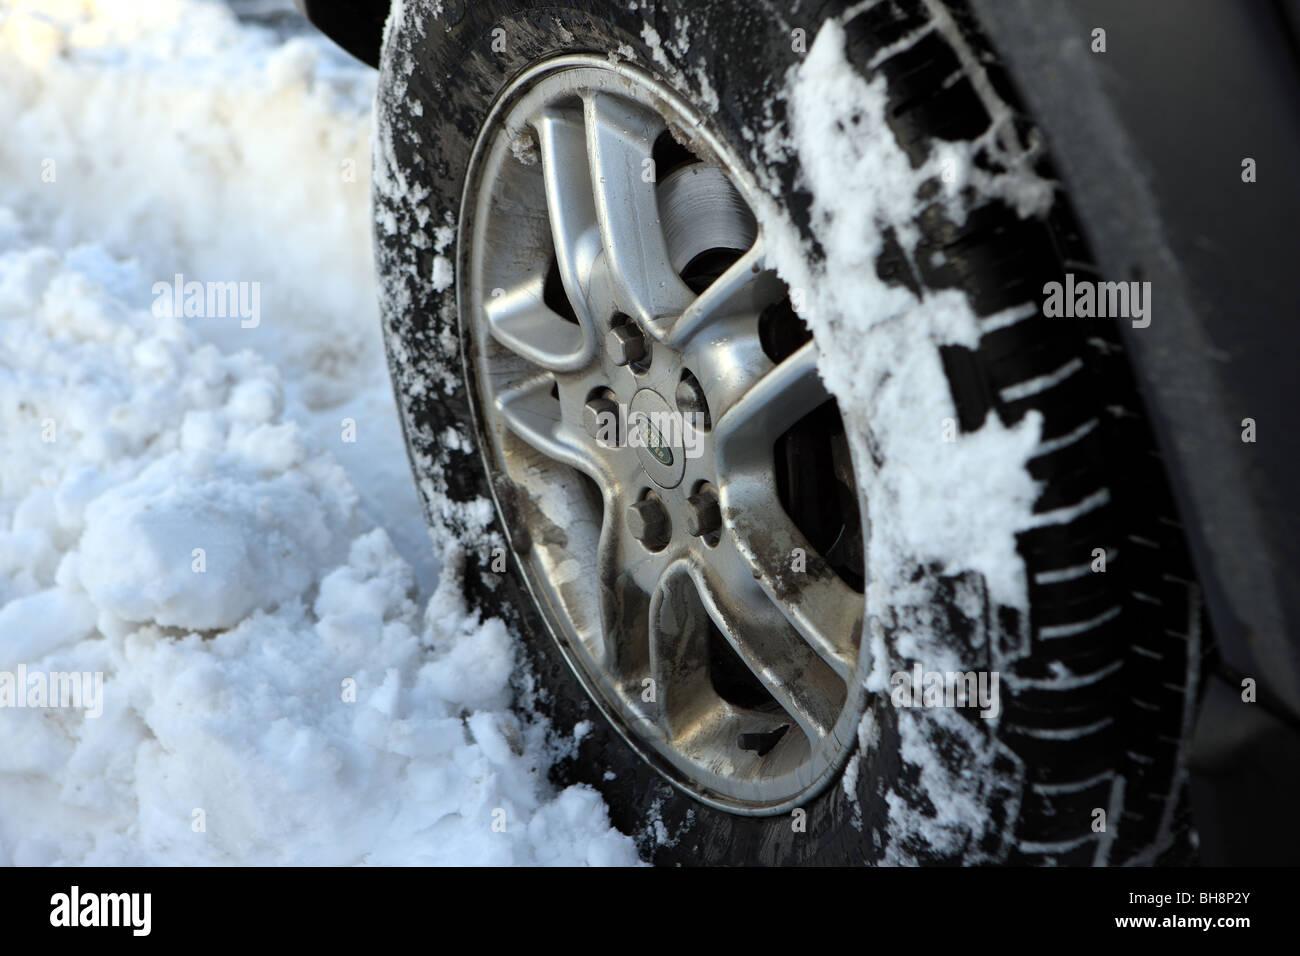 Land Rover wheel in deep snow - Stock Image